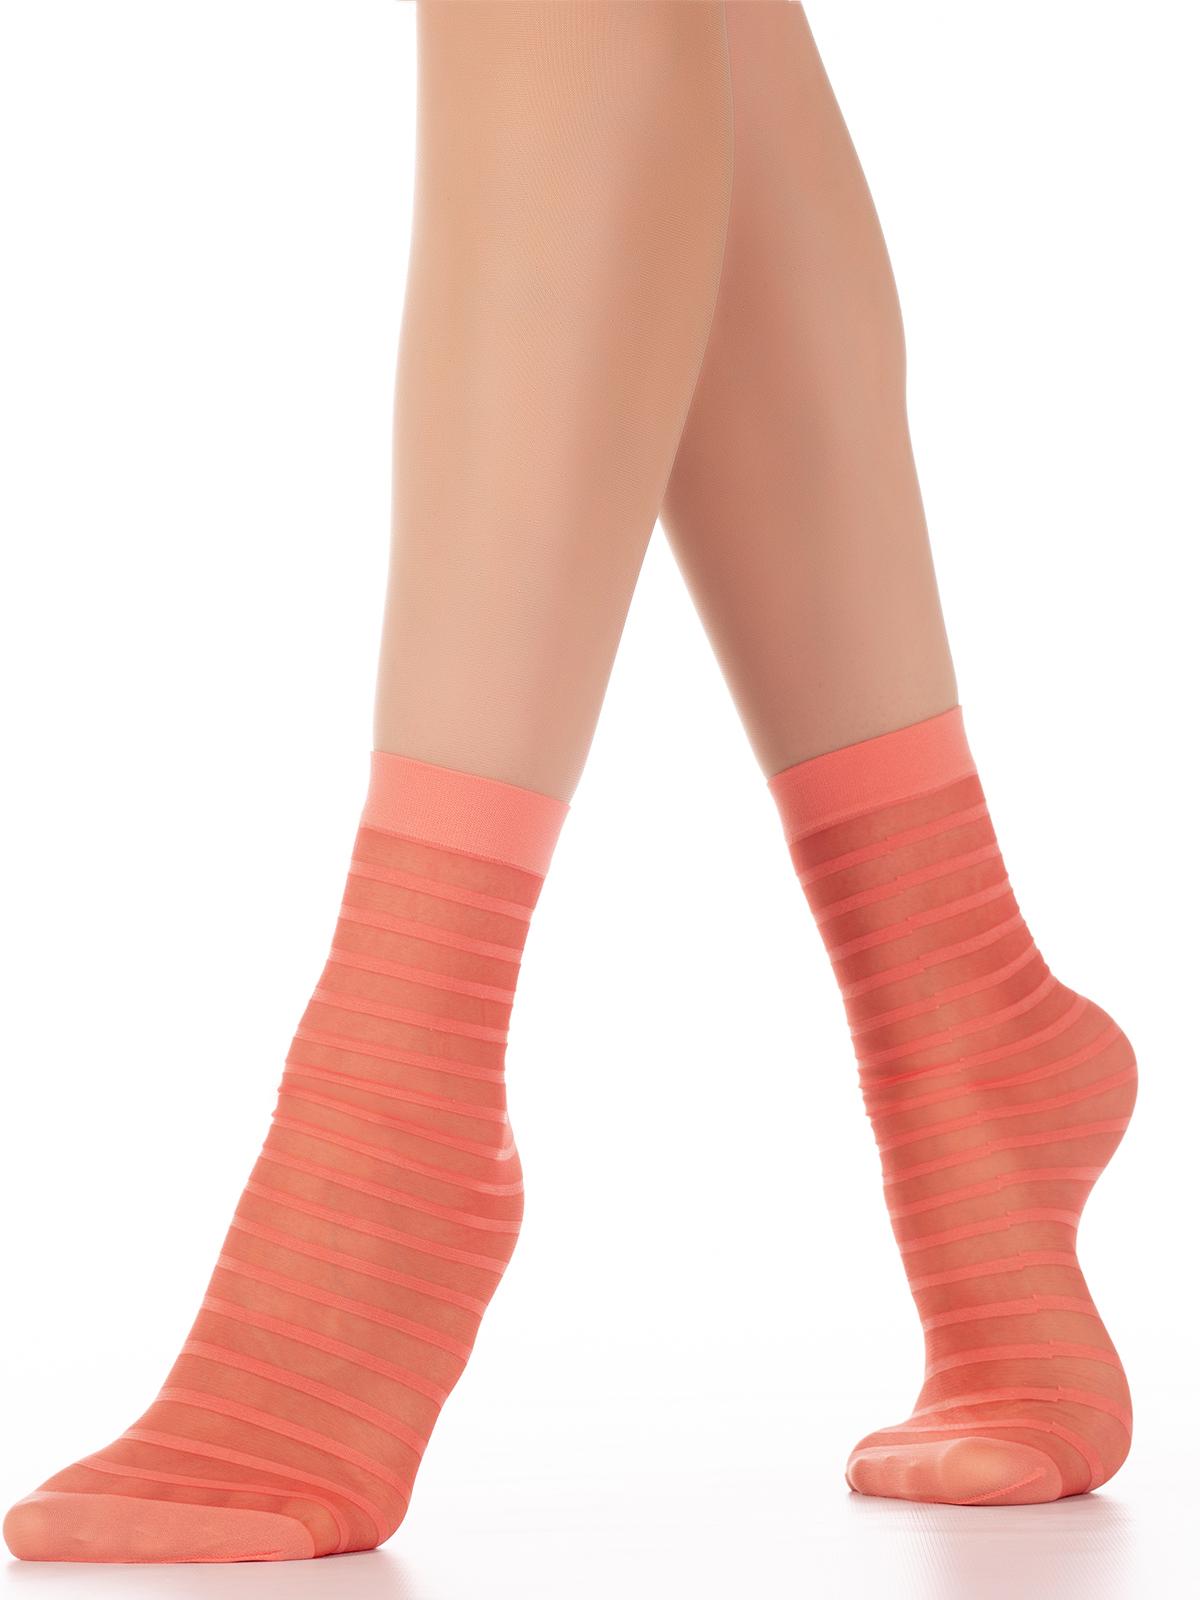 Носки женские MiNiMi FOLLETTO оранжевые one size